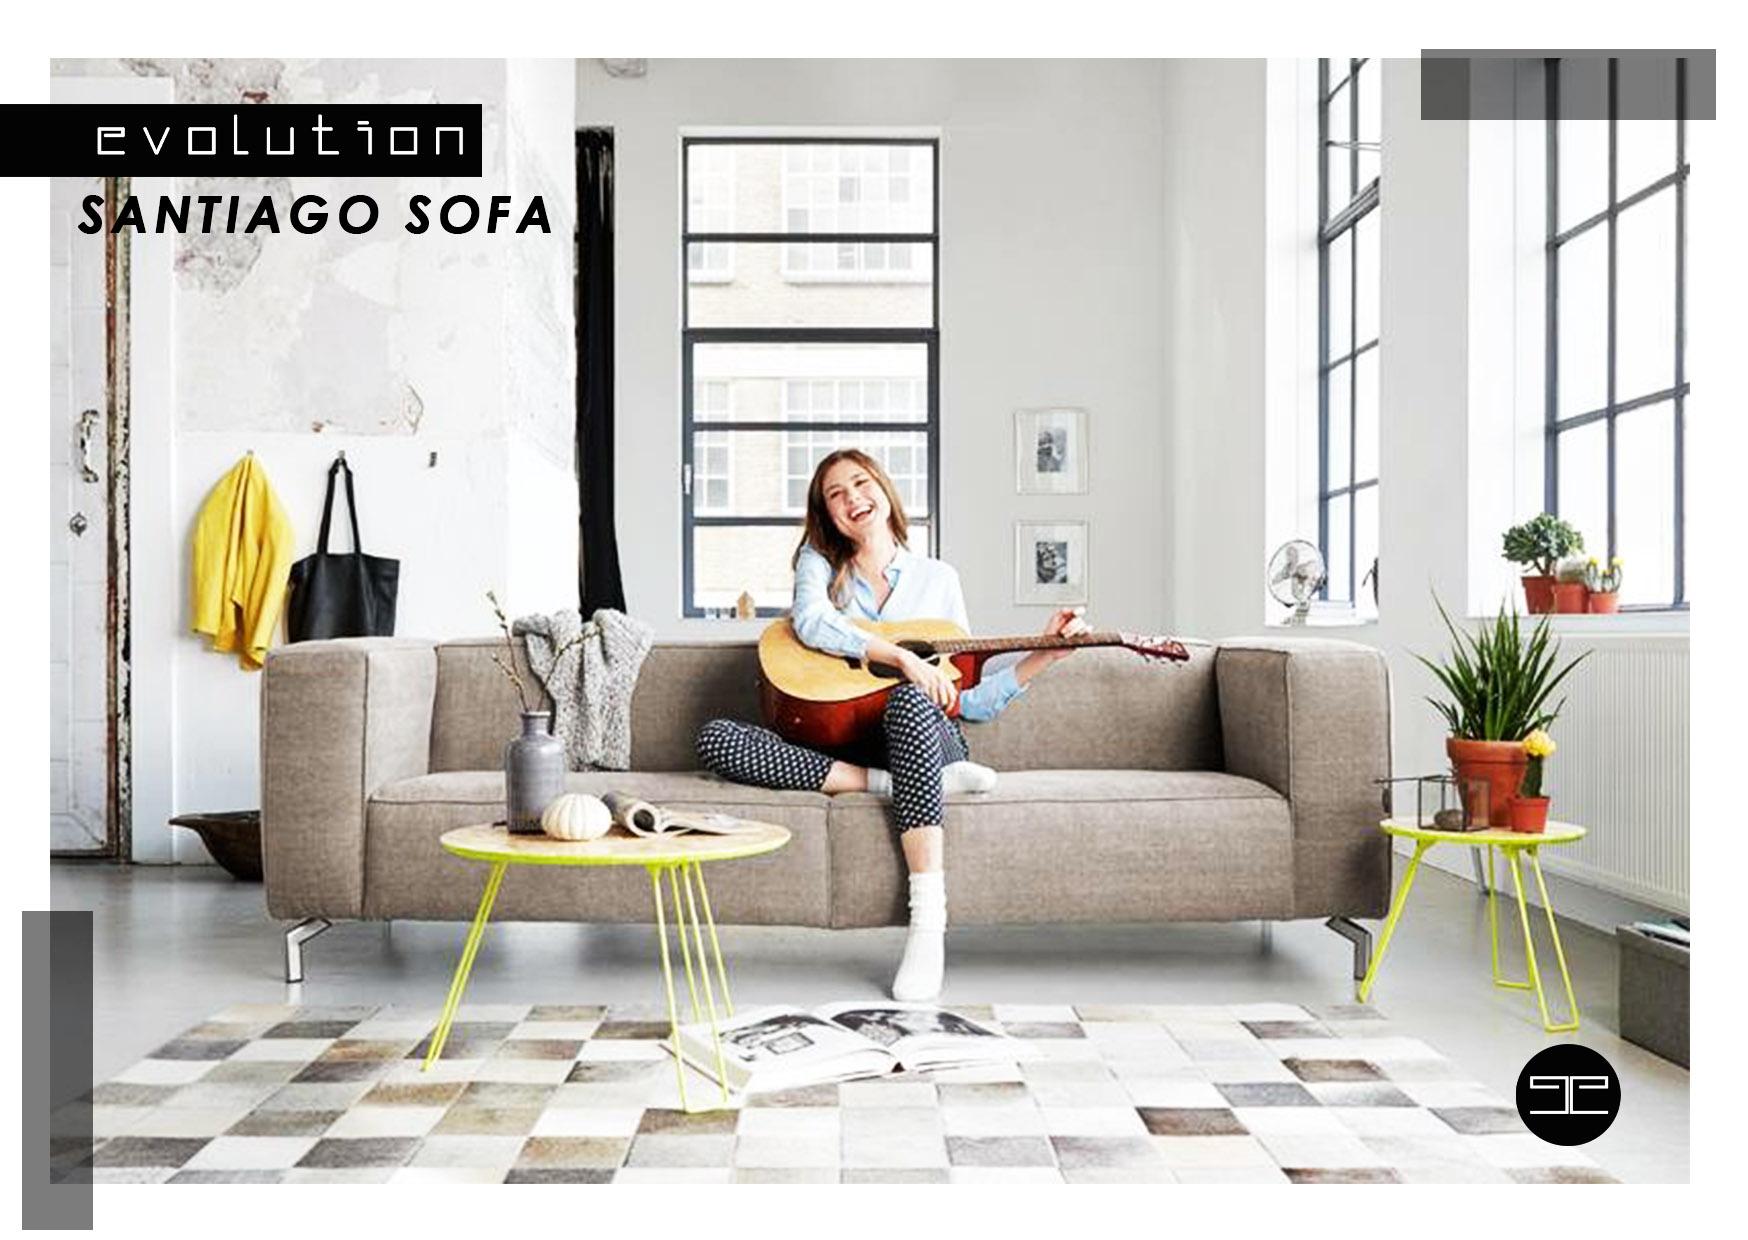 Evolution-Design Meubelen-Santiago